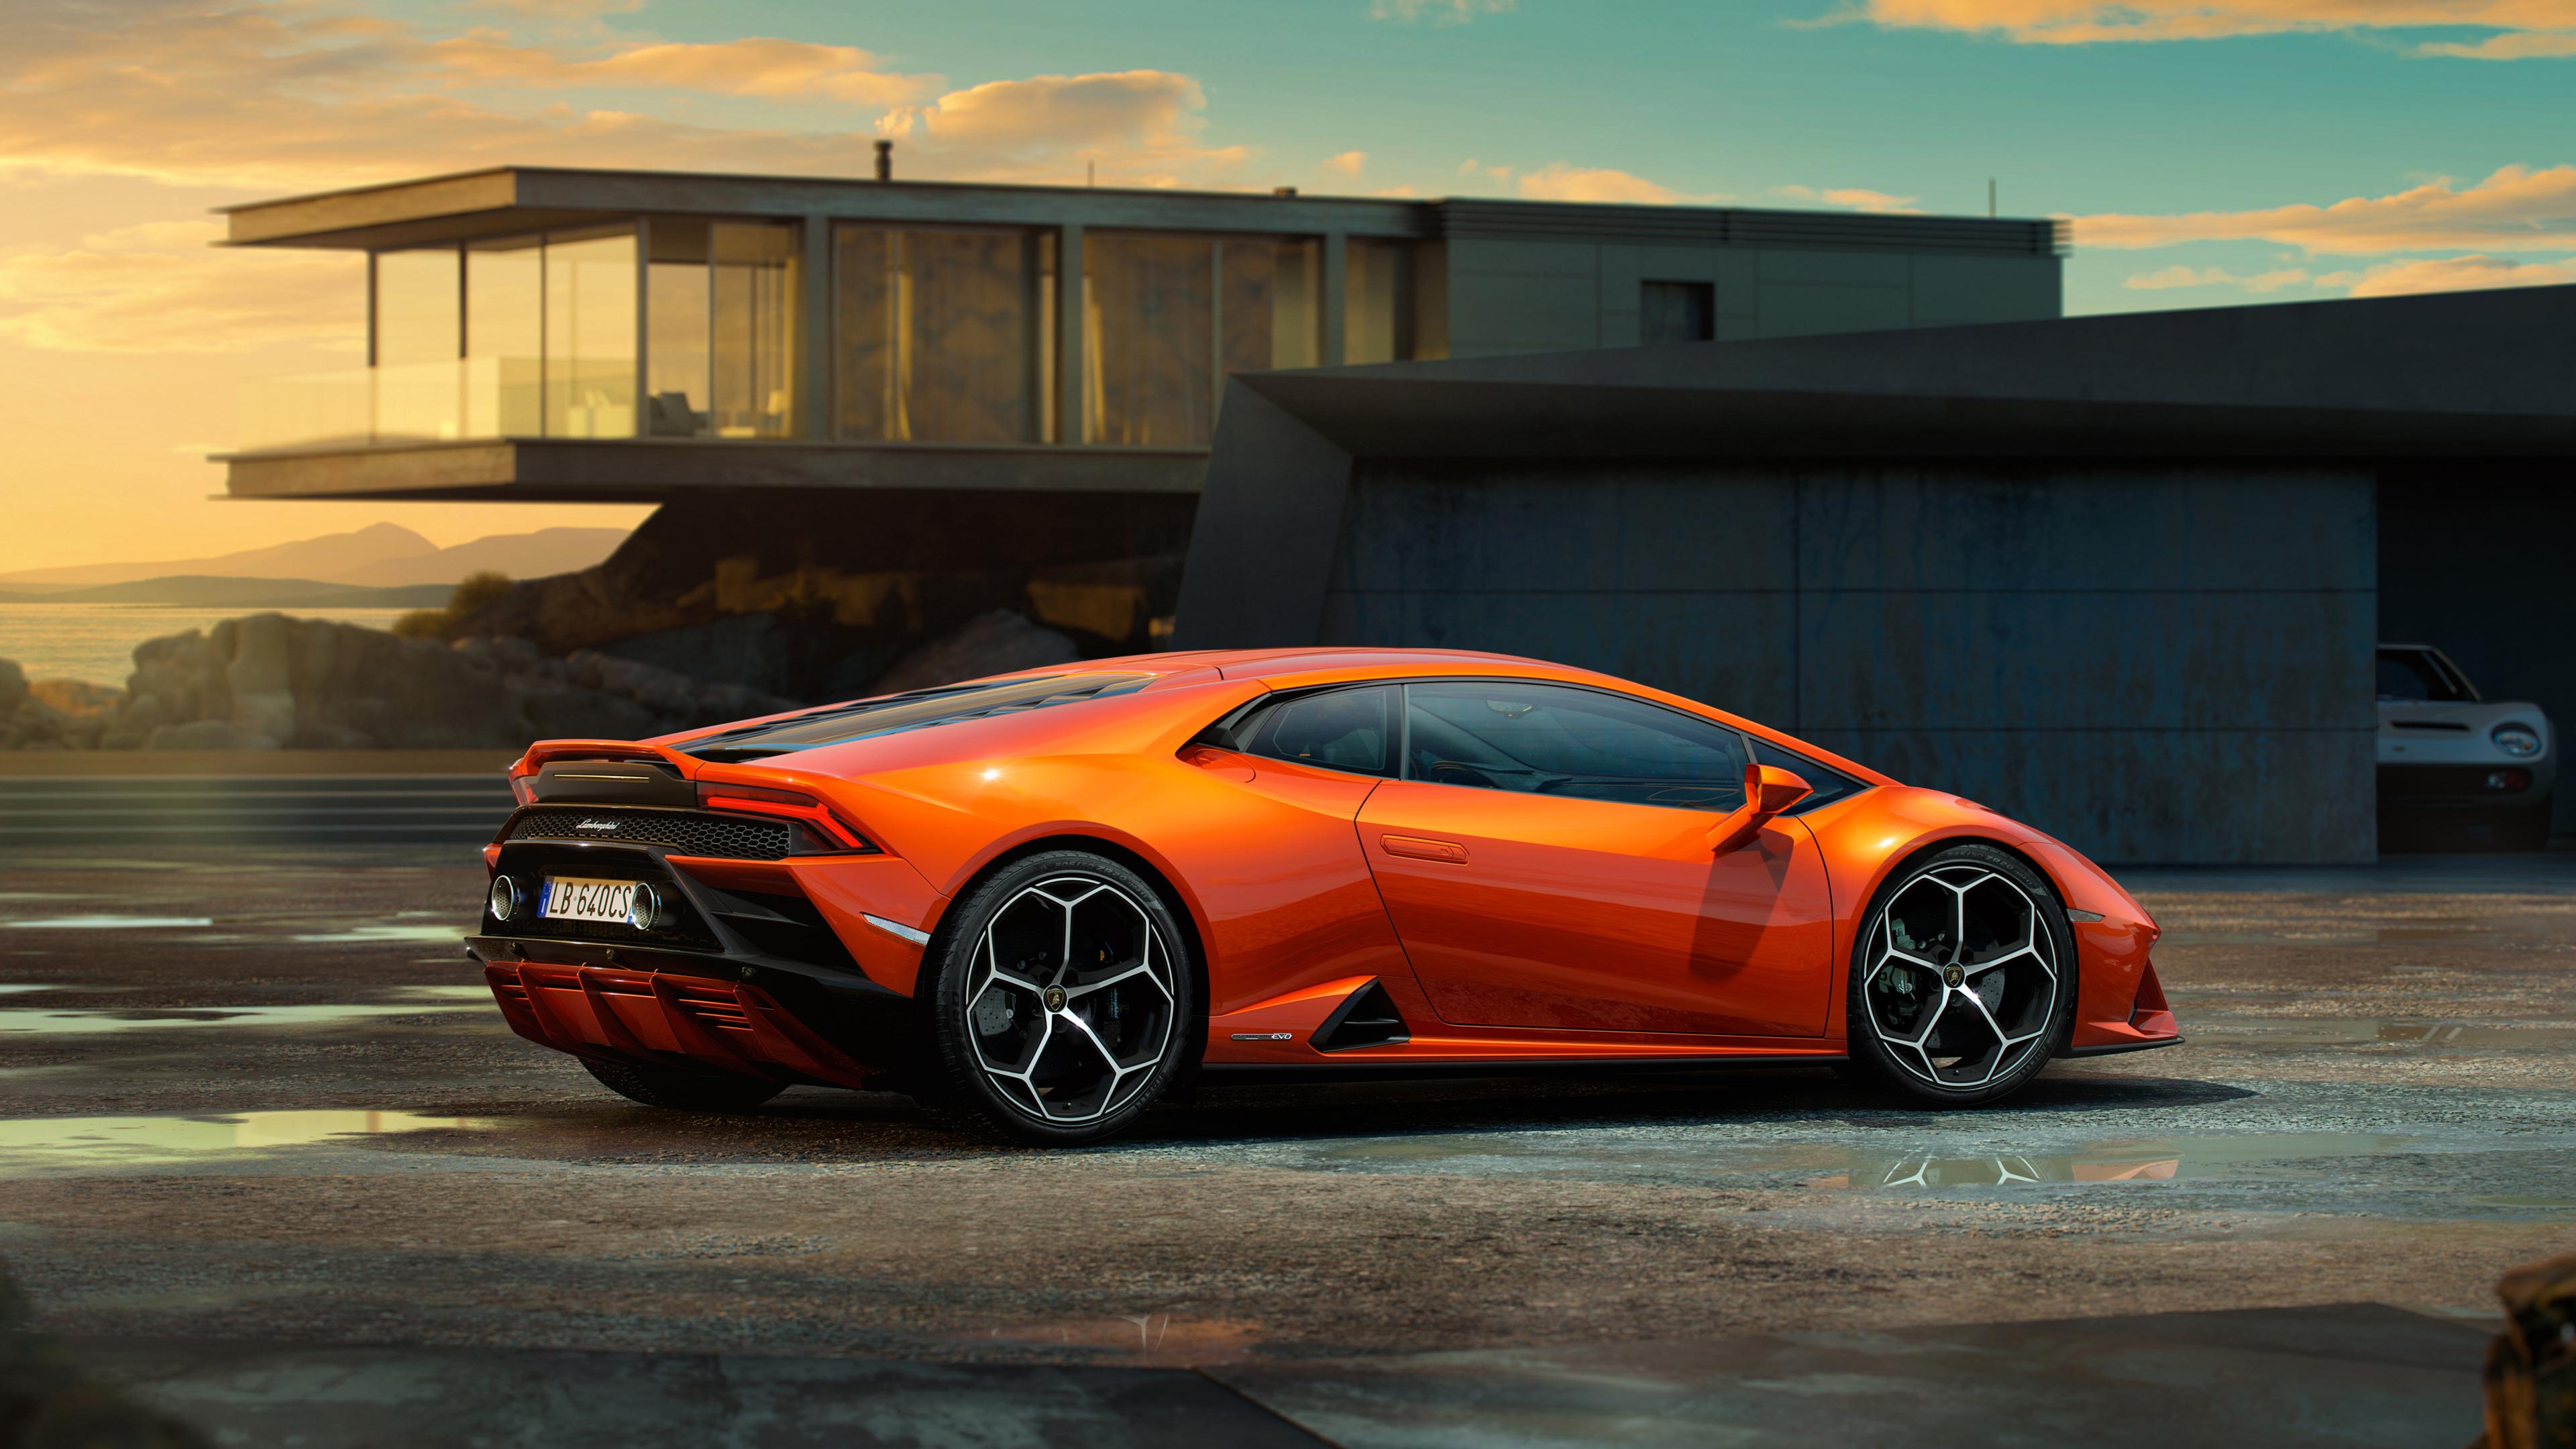 Wallpaper 4k Lamborghini Huracan Evo 2019 Side View 4k 4k Wallpapers